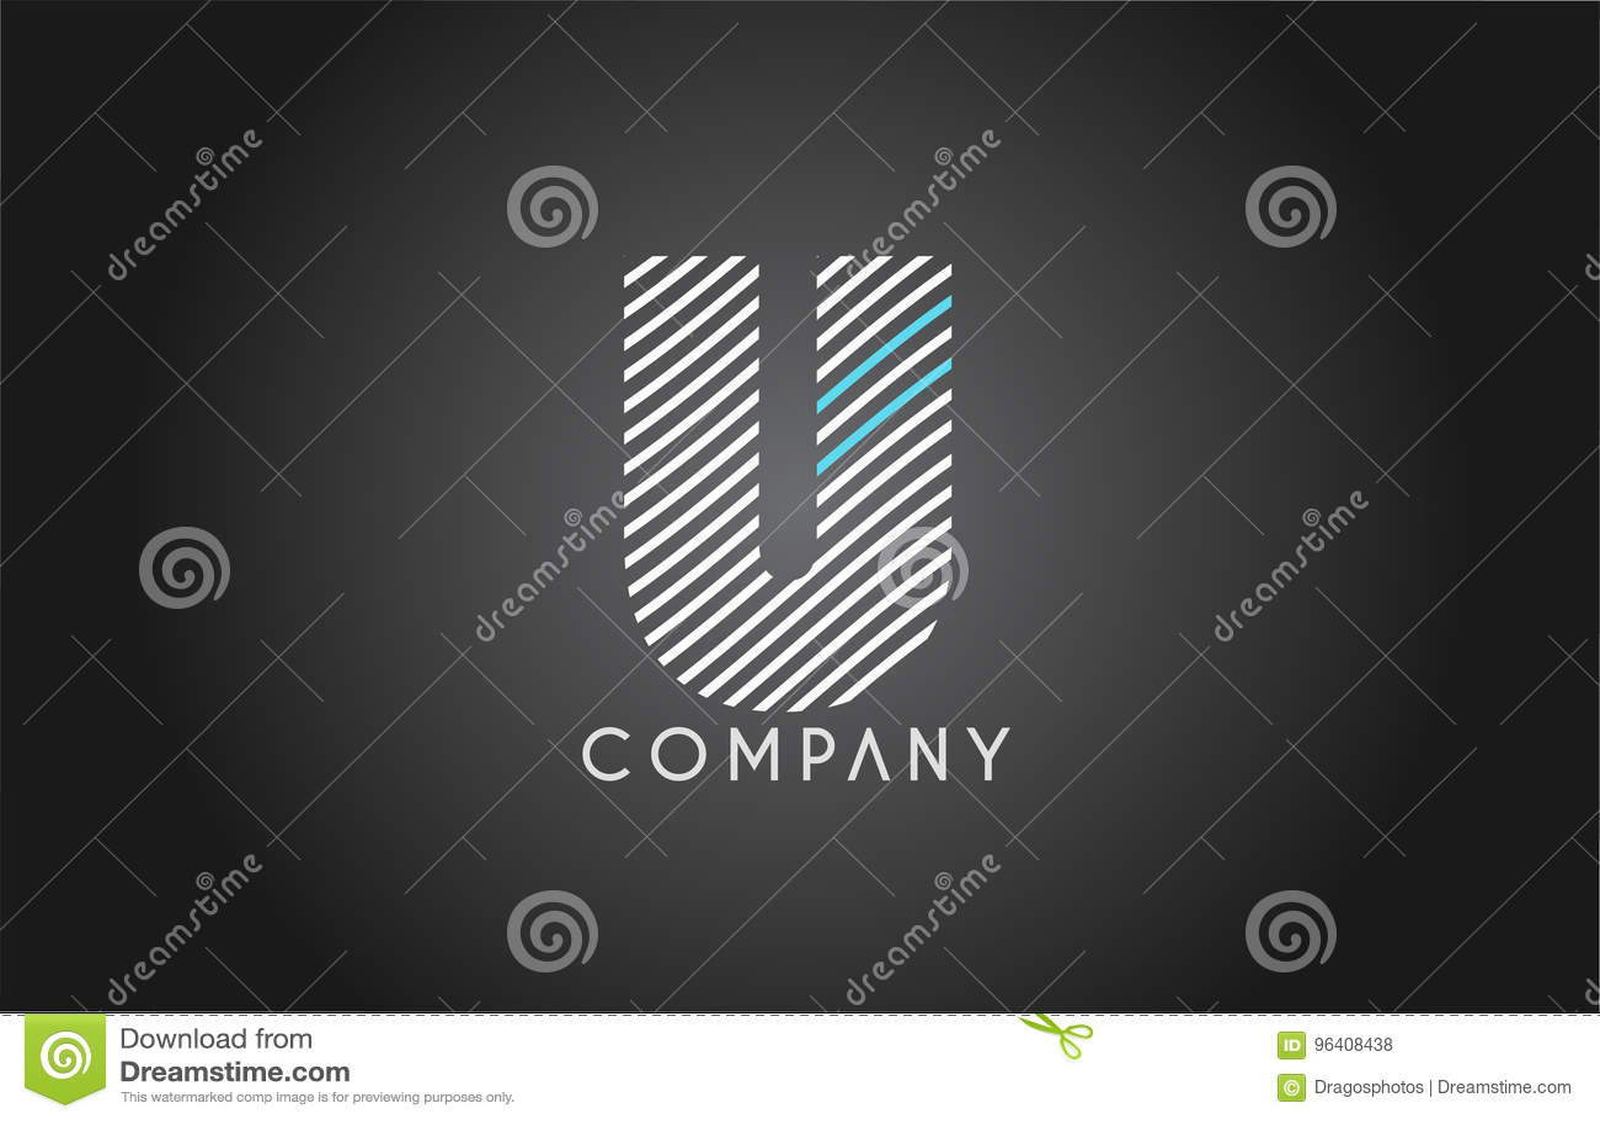 U alphabet line stripe white blue letter logo icon design stock u alphabet line stripe white blue letter logo icon design biocorpaavc Image collections